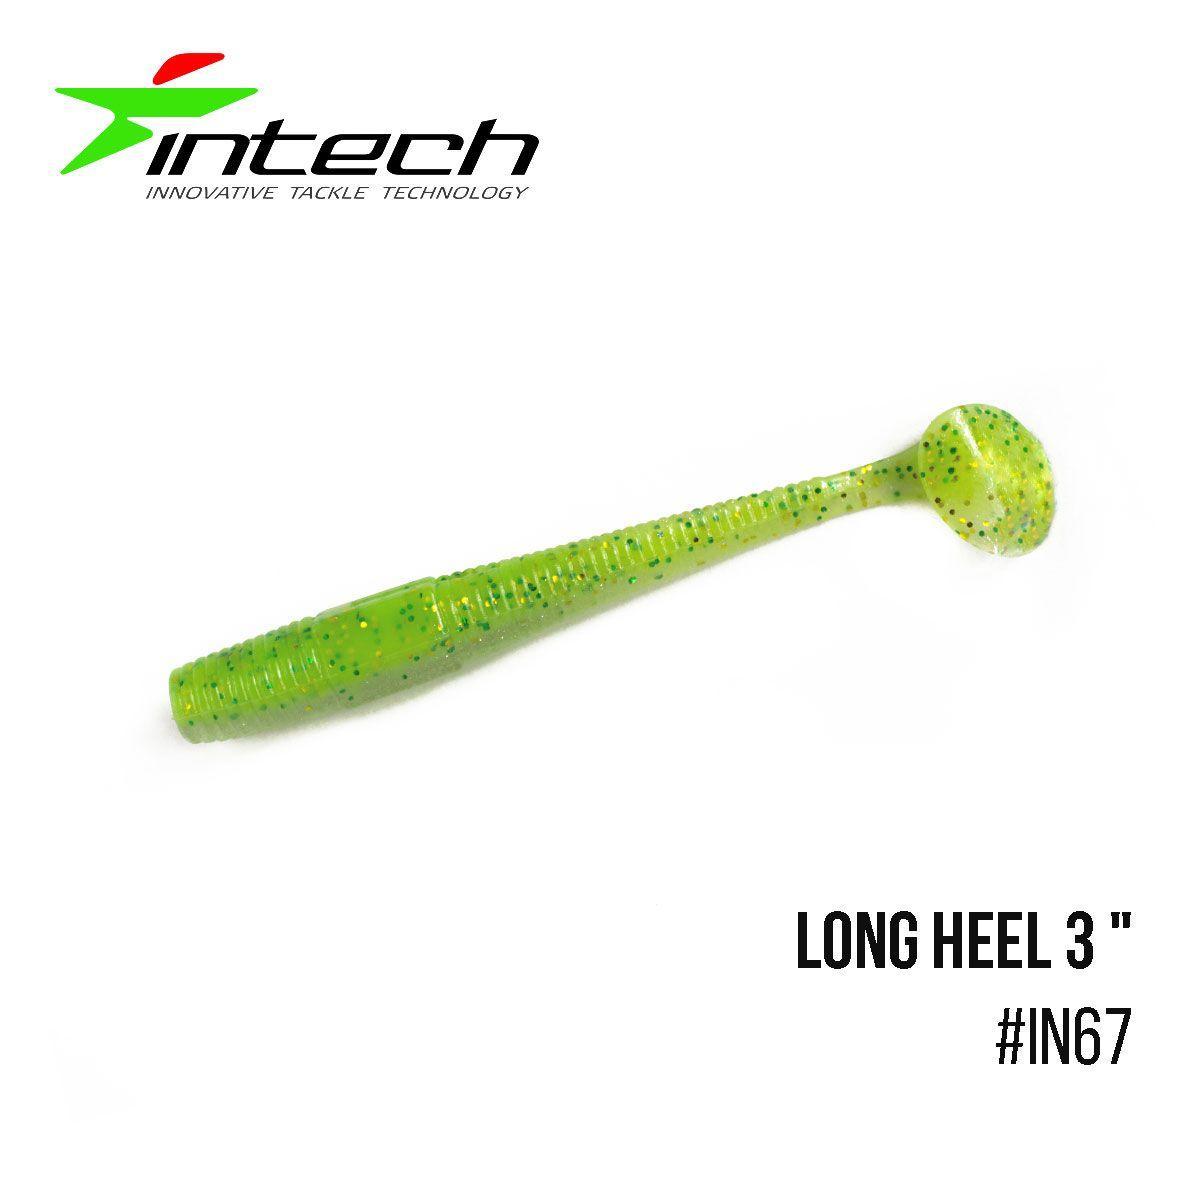 """.Приманка Intech Long Heel 3 ""(8 шт) (IN67)"